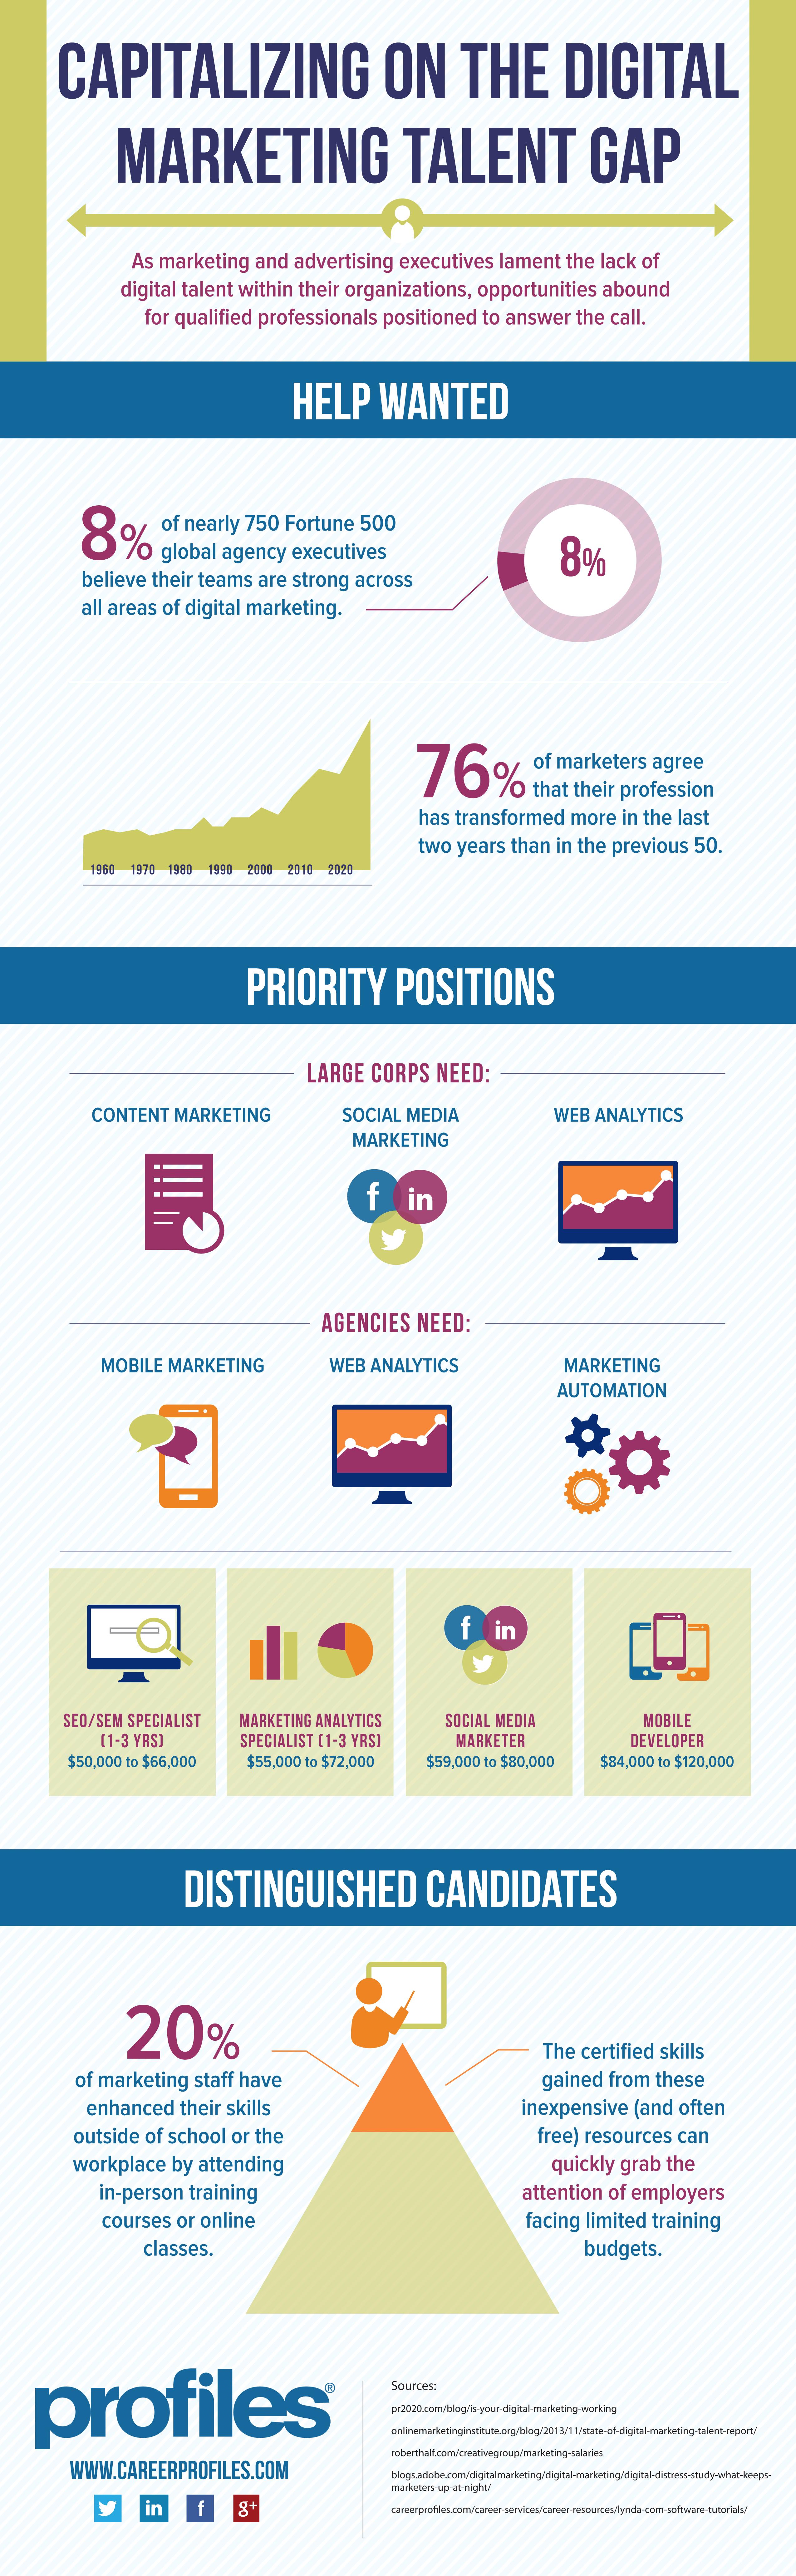 job seekers should capitalize on digital marketing skills gap every